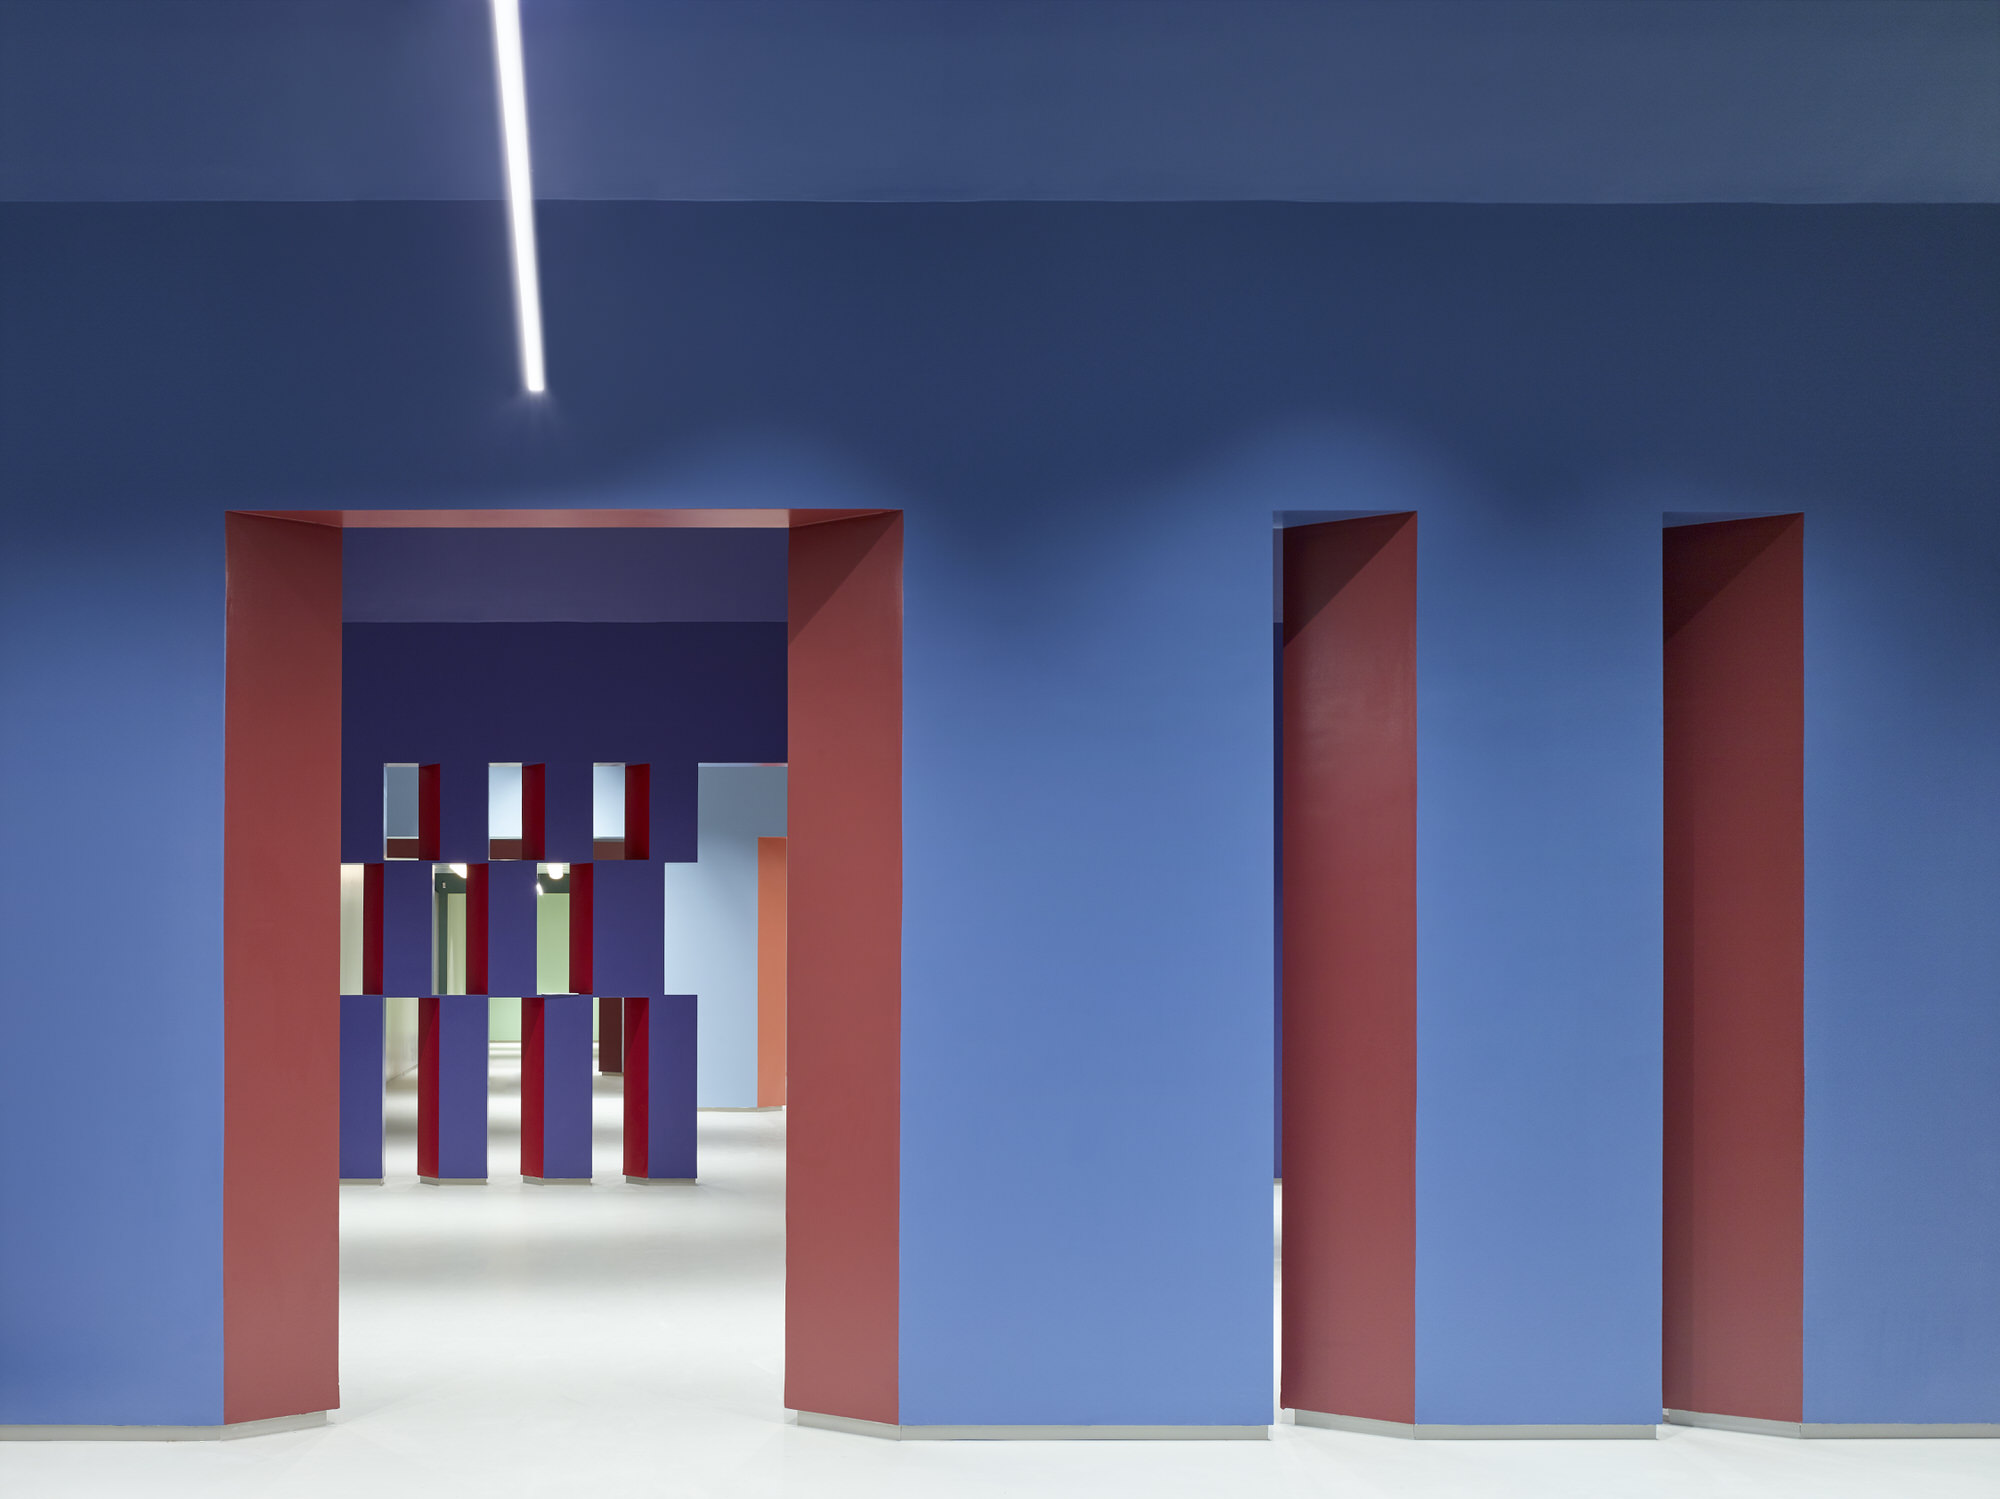 Baranowitz Goldberg Kaza Israel Showroom Interior Design Photo Shai Gil Yellowtrace 01